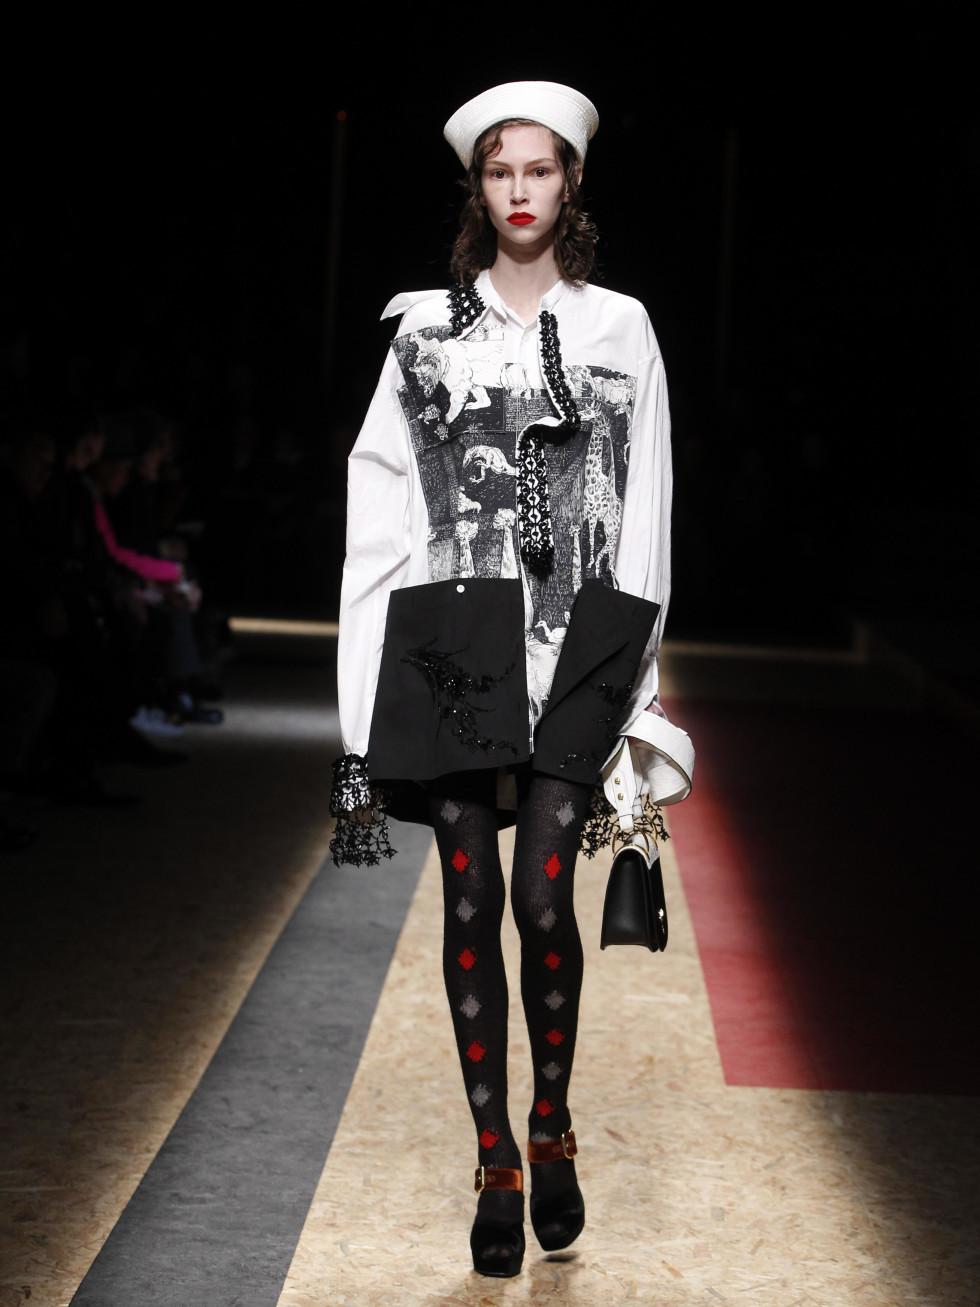 Prada menswear show with women's look in Milan January 2016